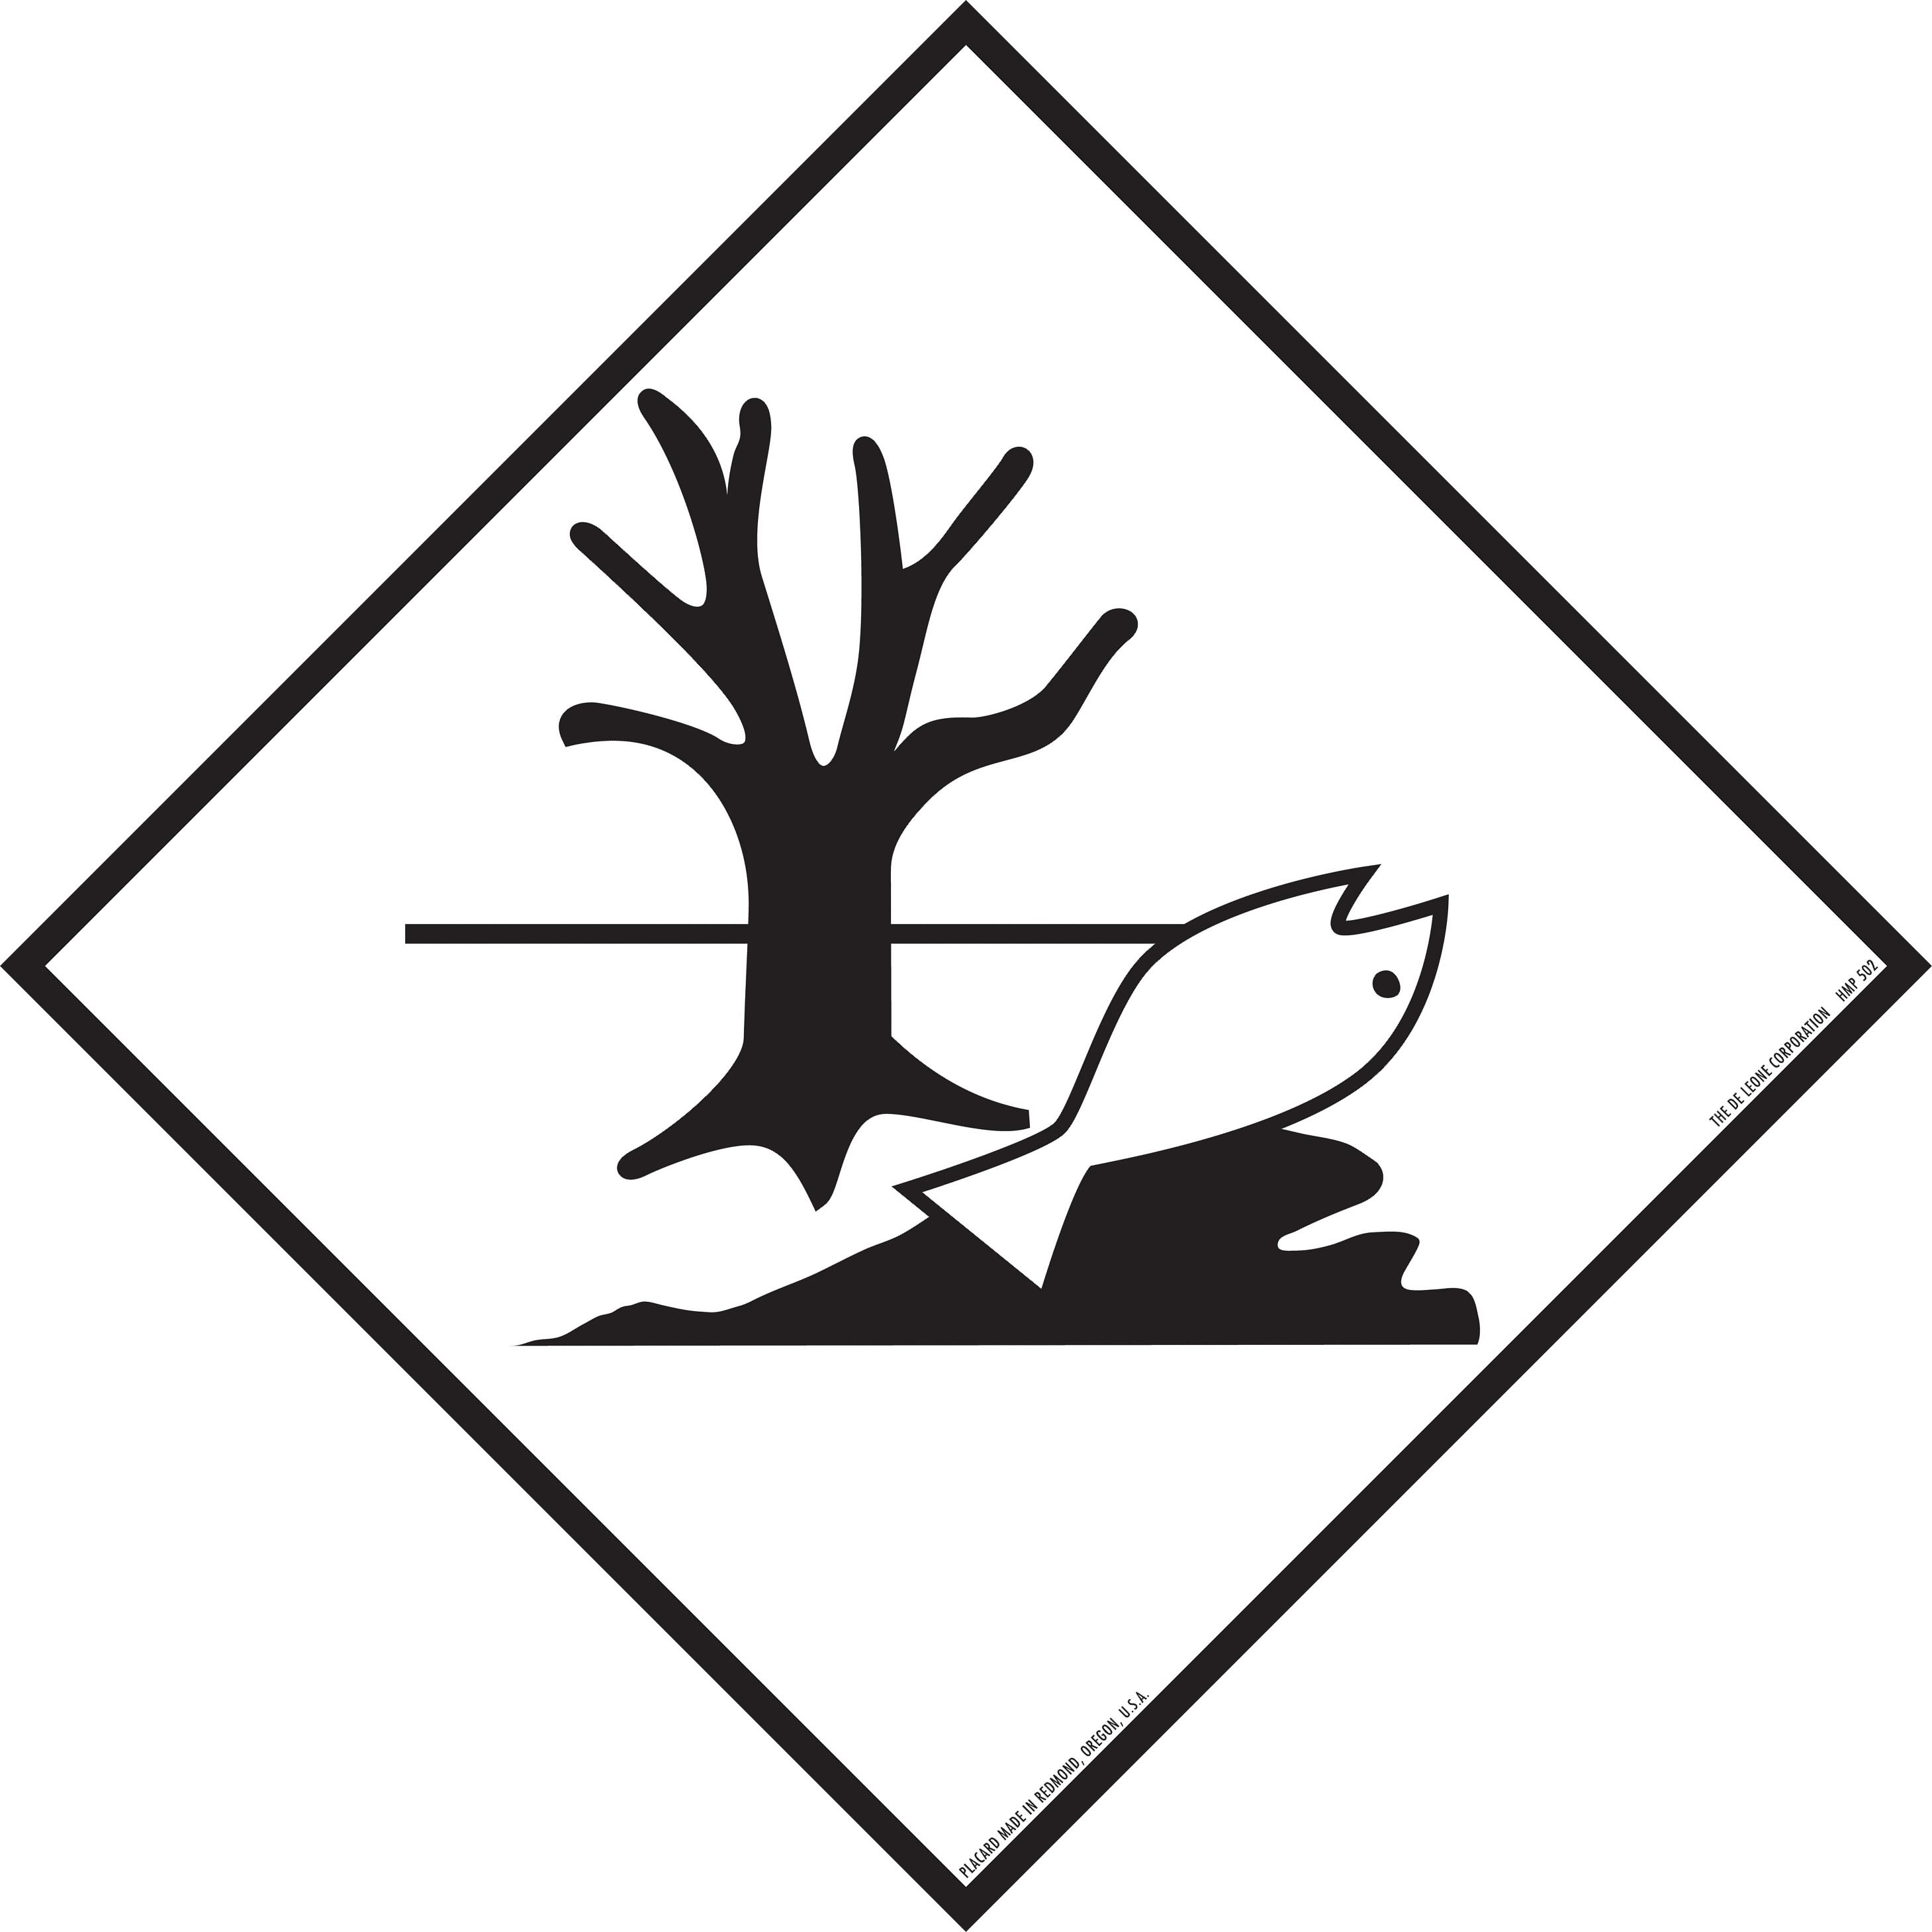 2919x2919 vinyl label dead fish, dead tree, marine pollutant